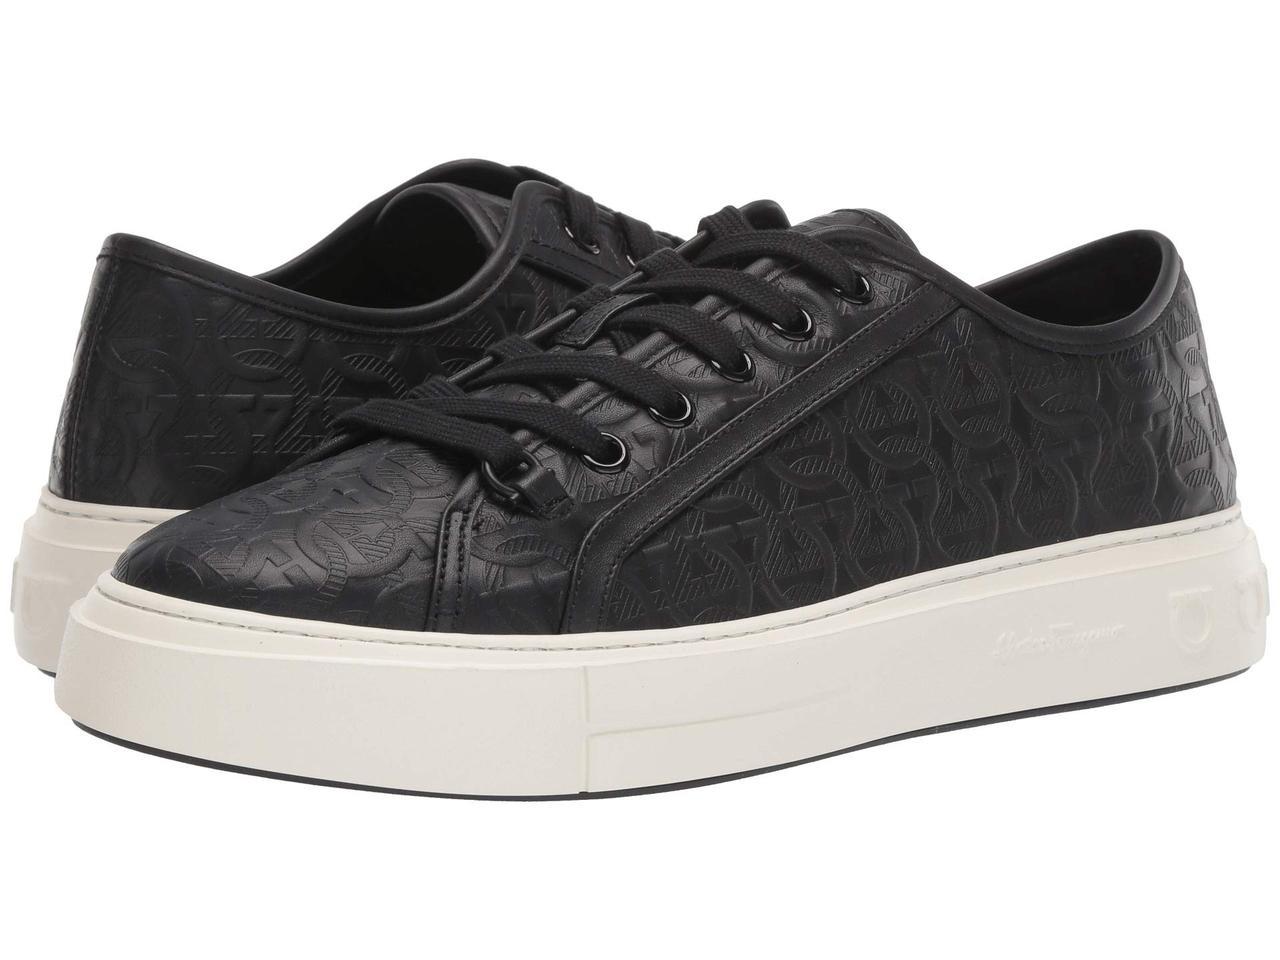 Кроссовки/Кеды (Оригинал) Salvatore Ferragamo Anson 2 Sneaker Black